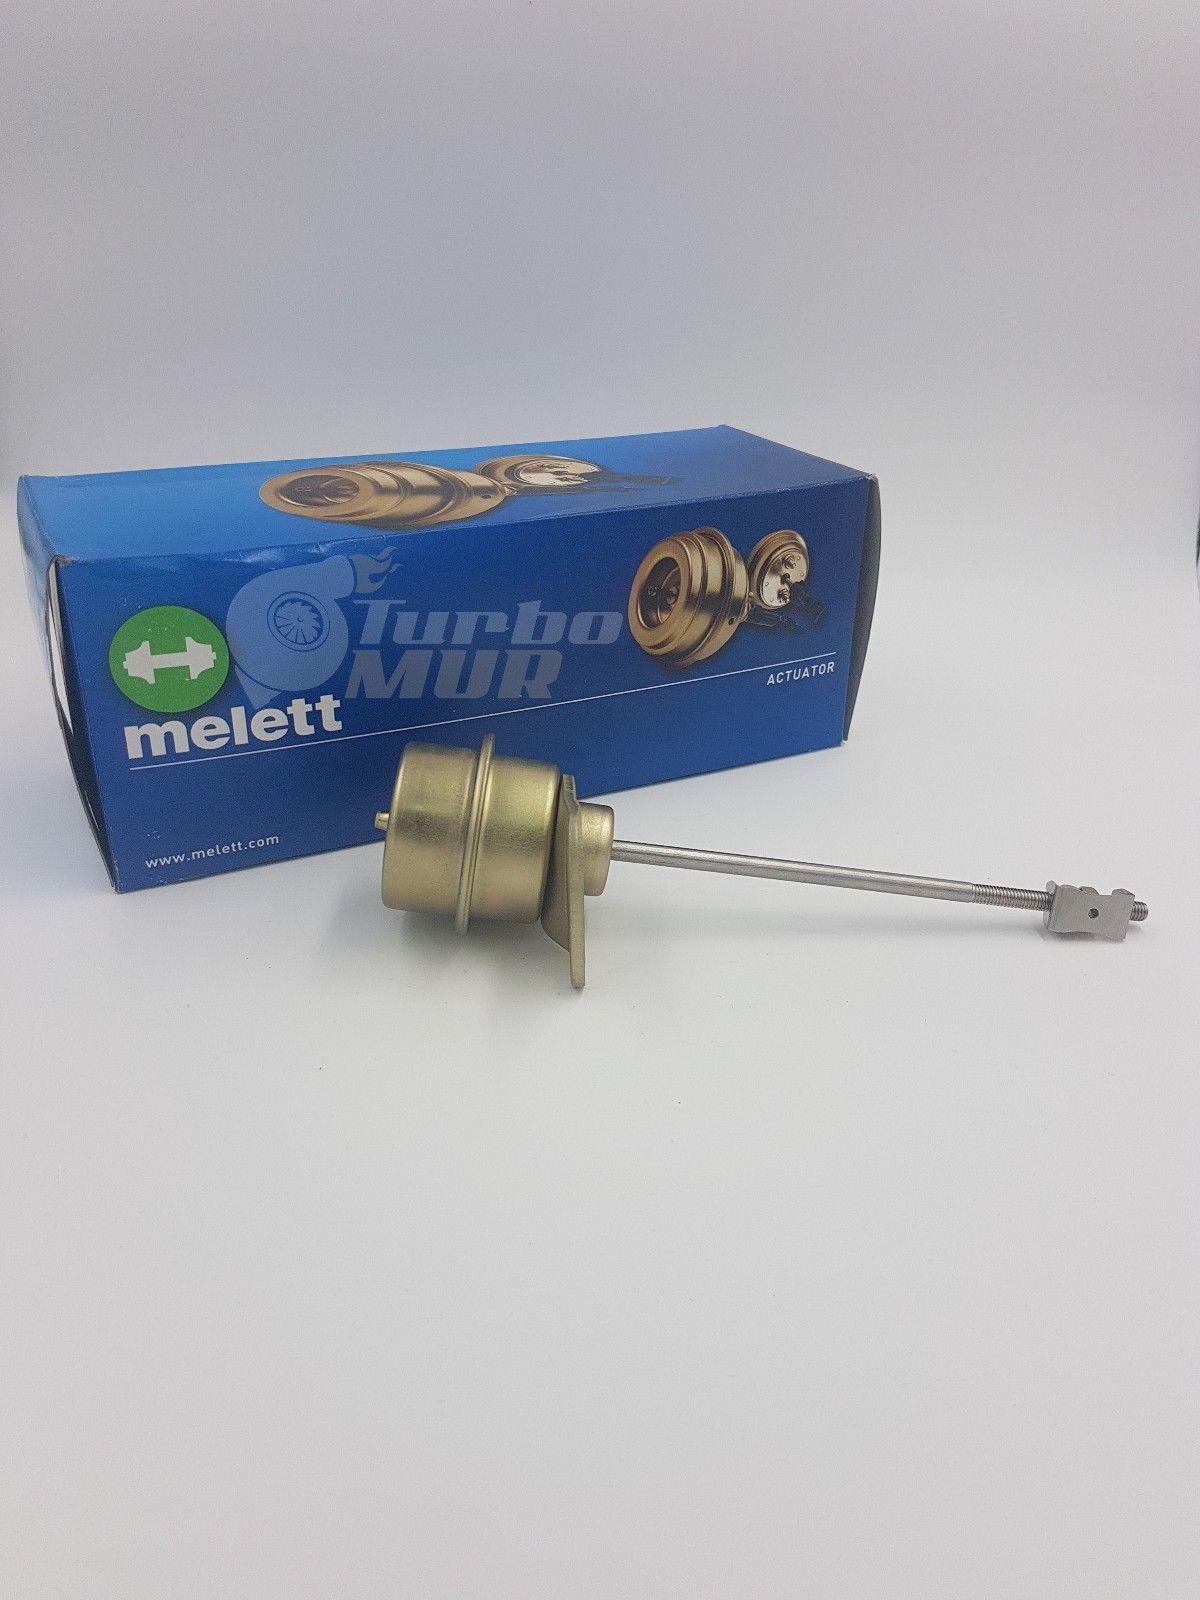 Turbomur - Actuador Mercedes K03 5303-970-0019